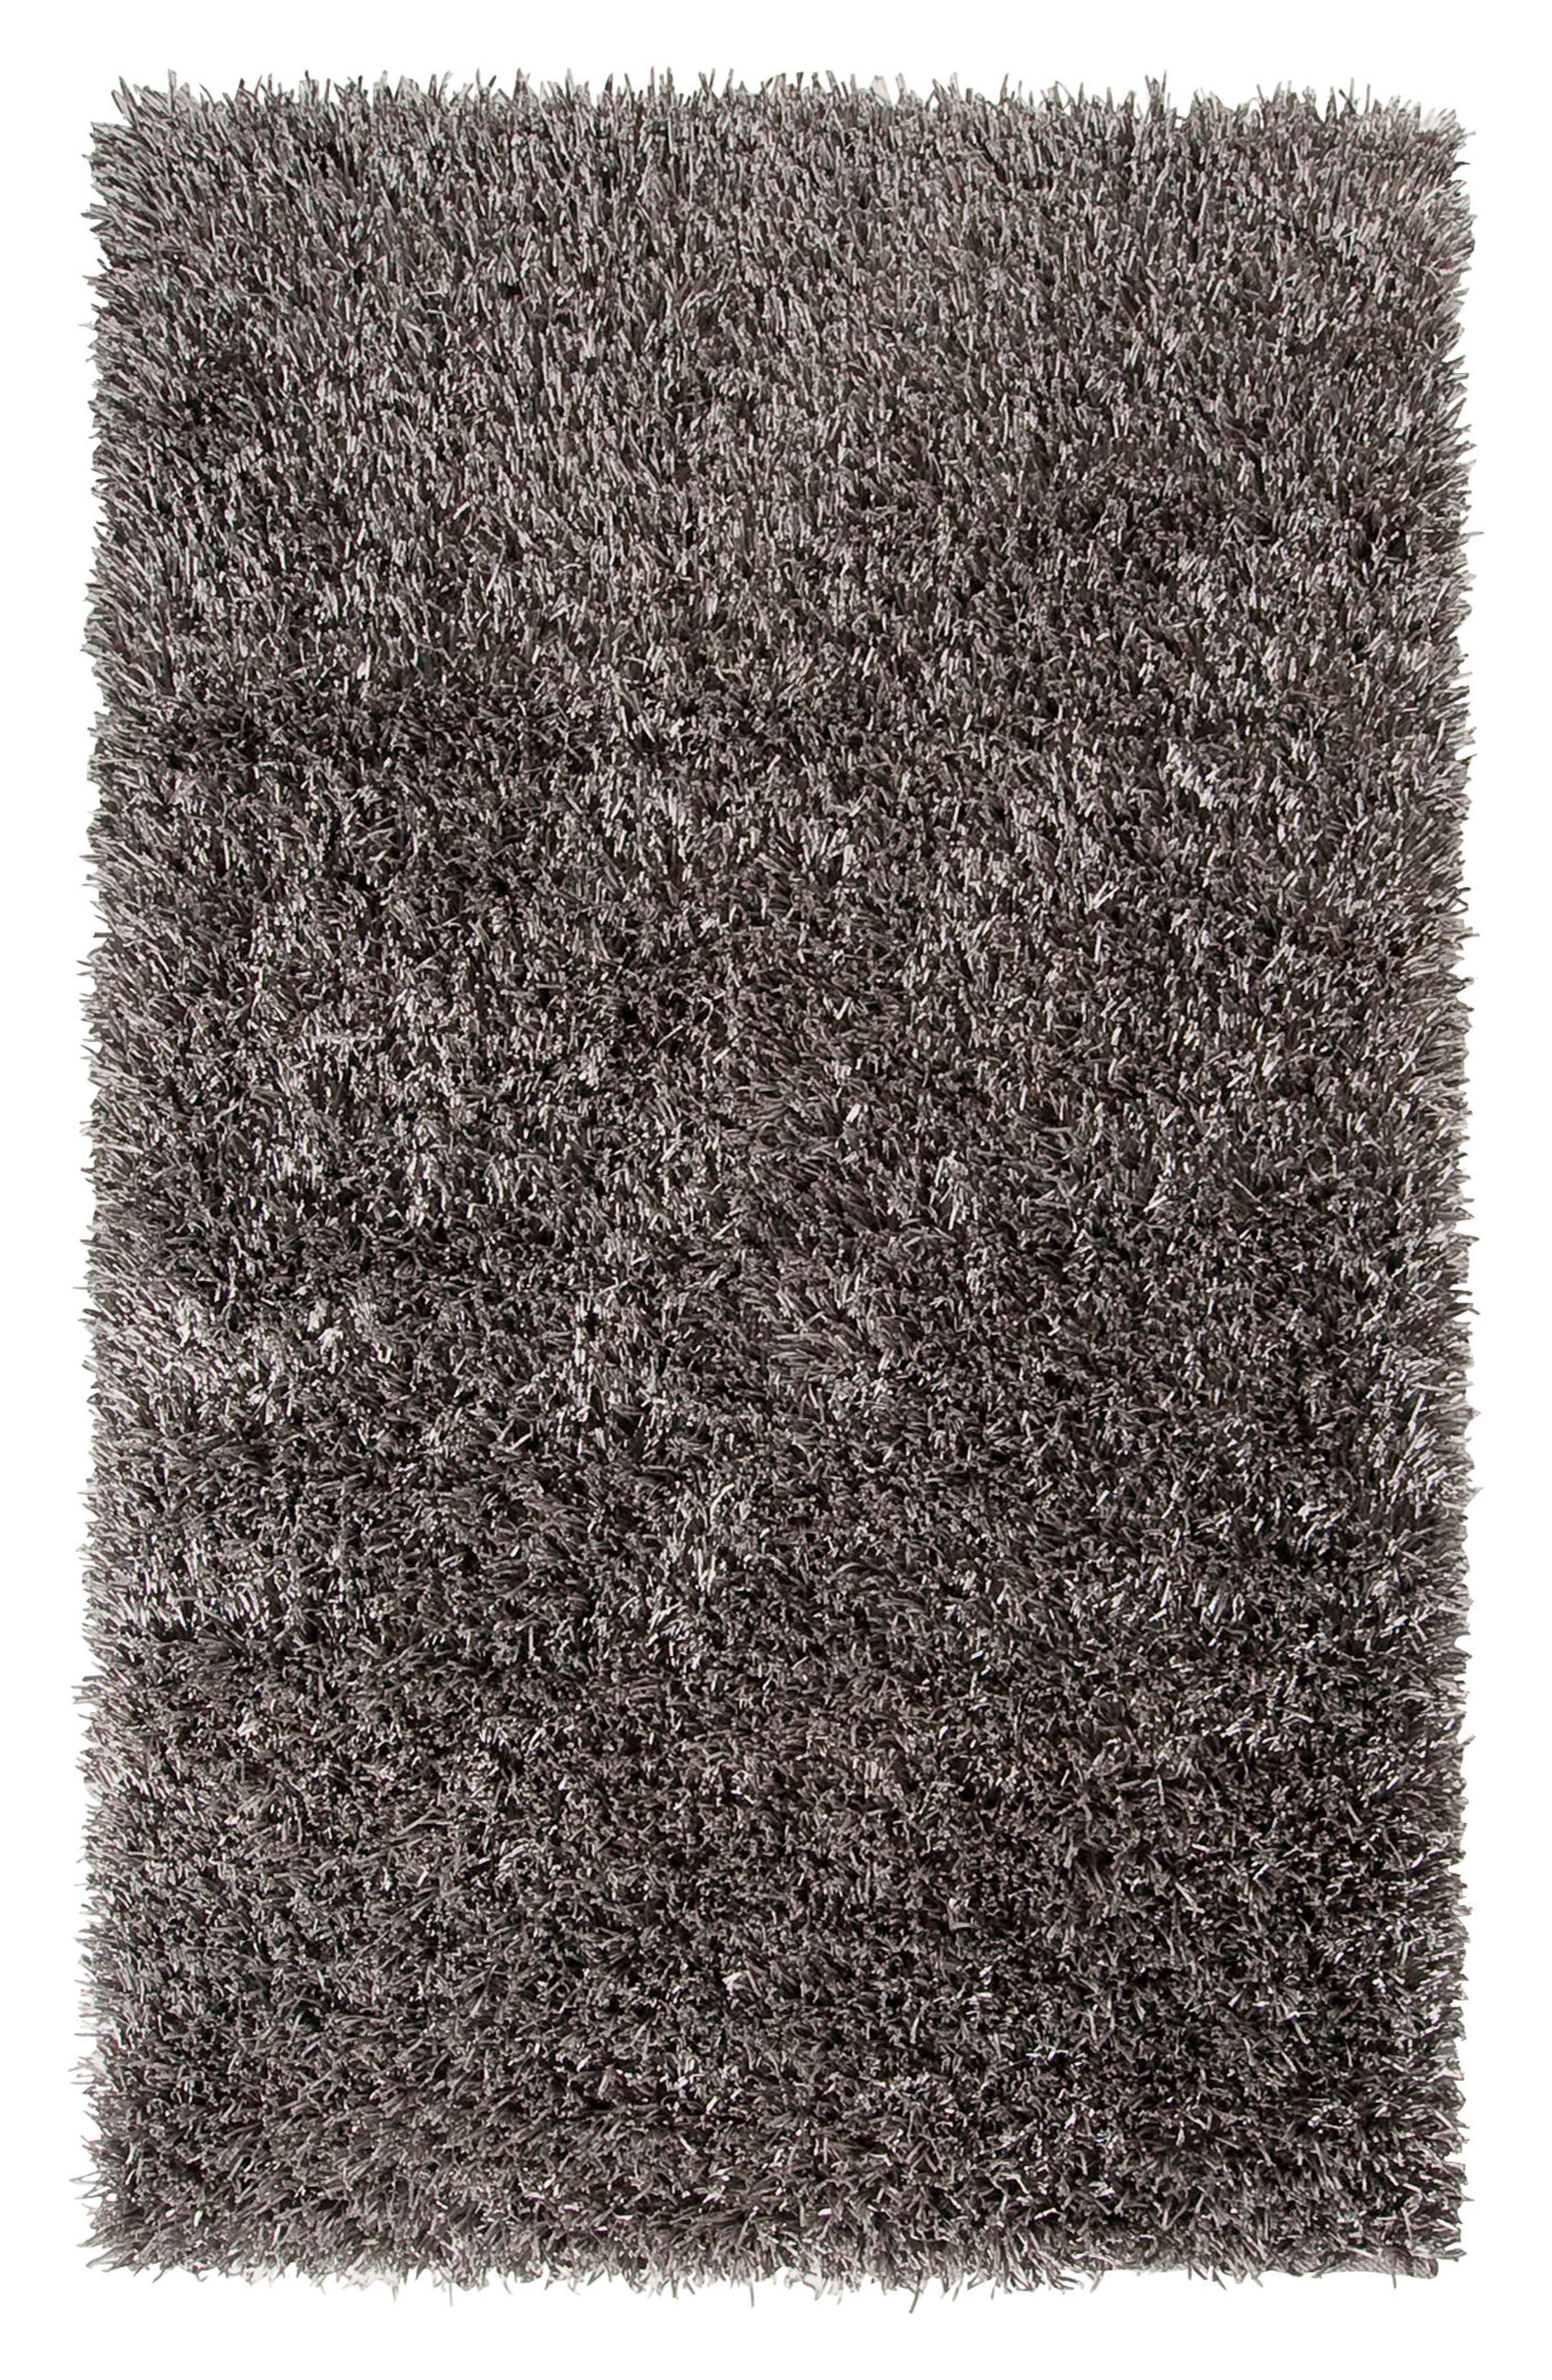 Alternate Image 1 Selected - Surya Home Shimmer Area Rug